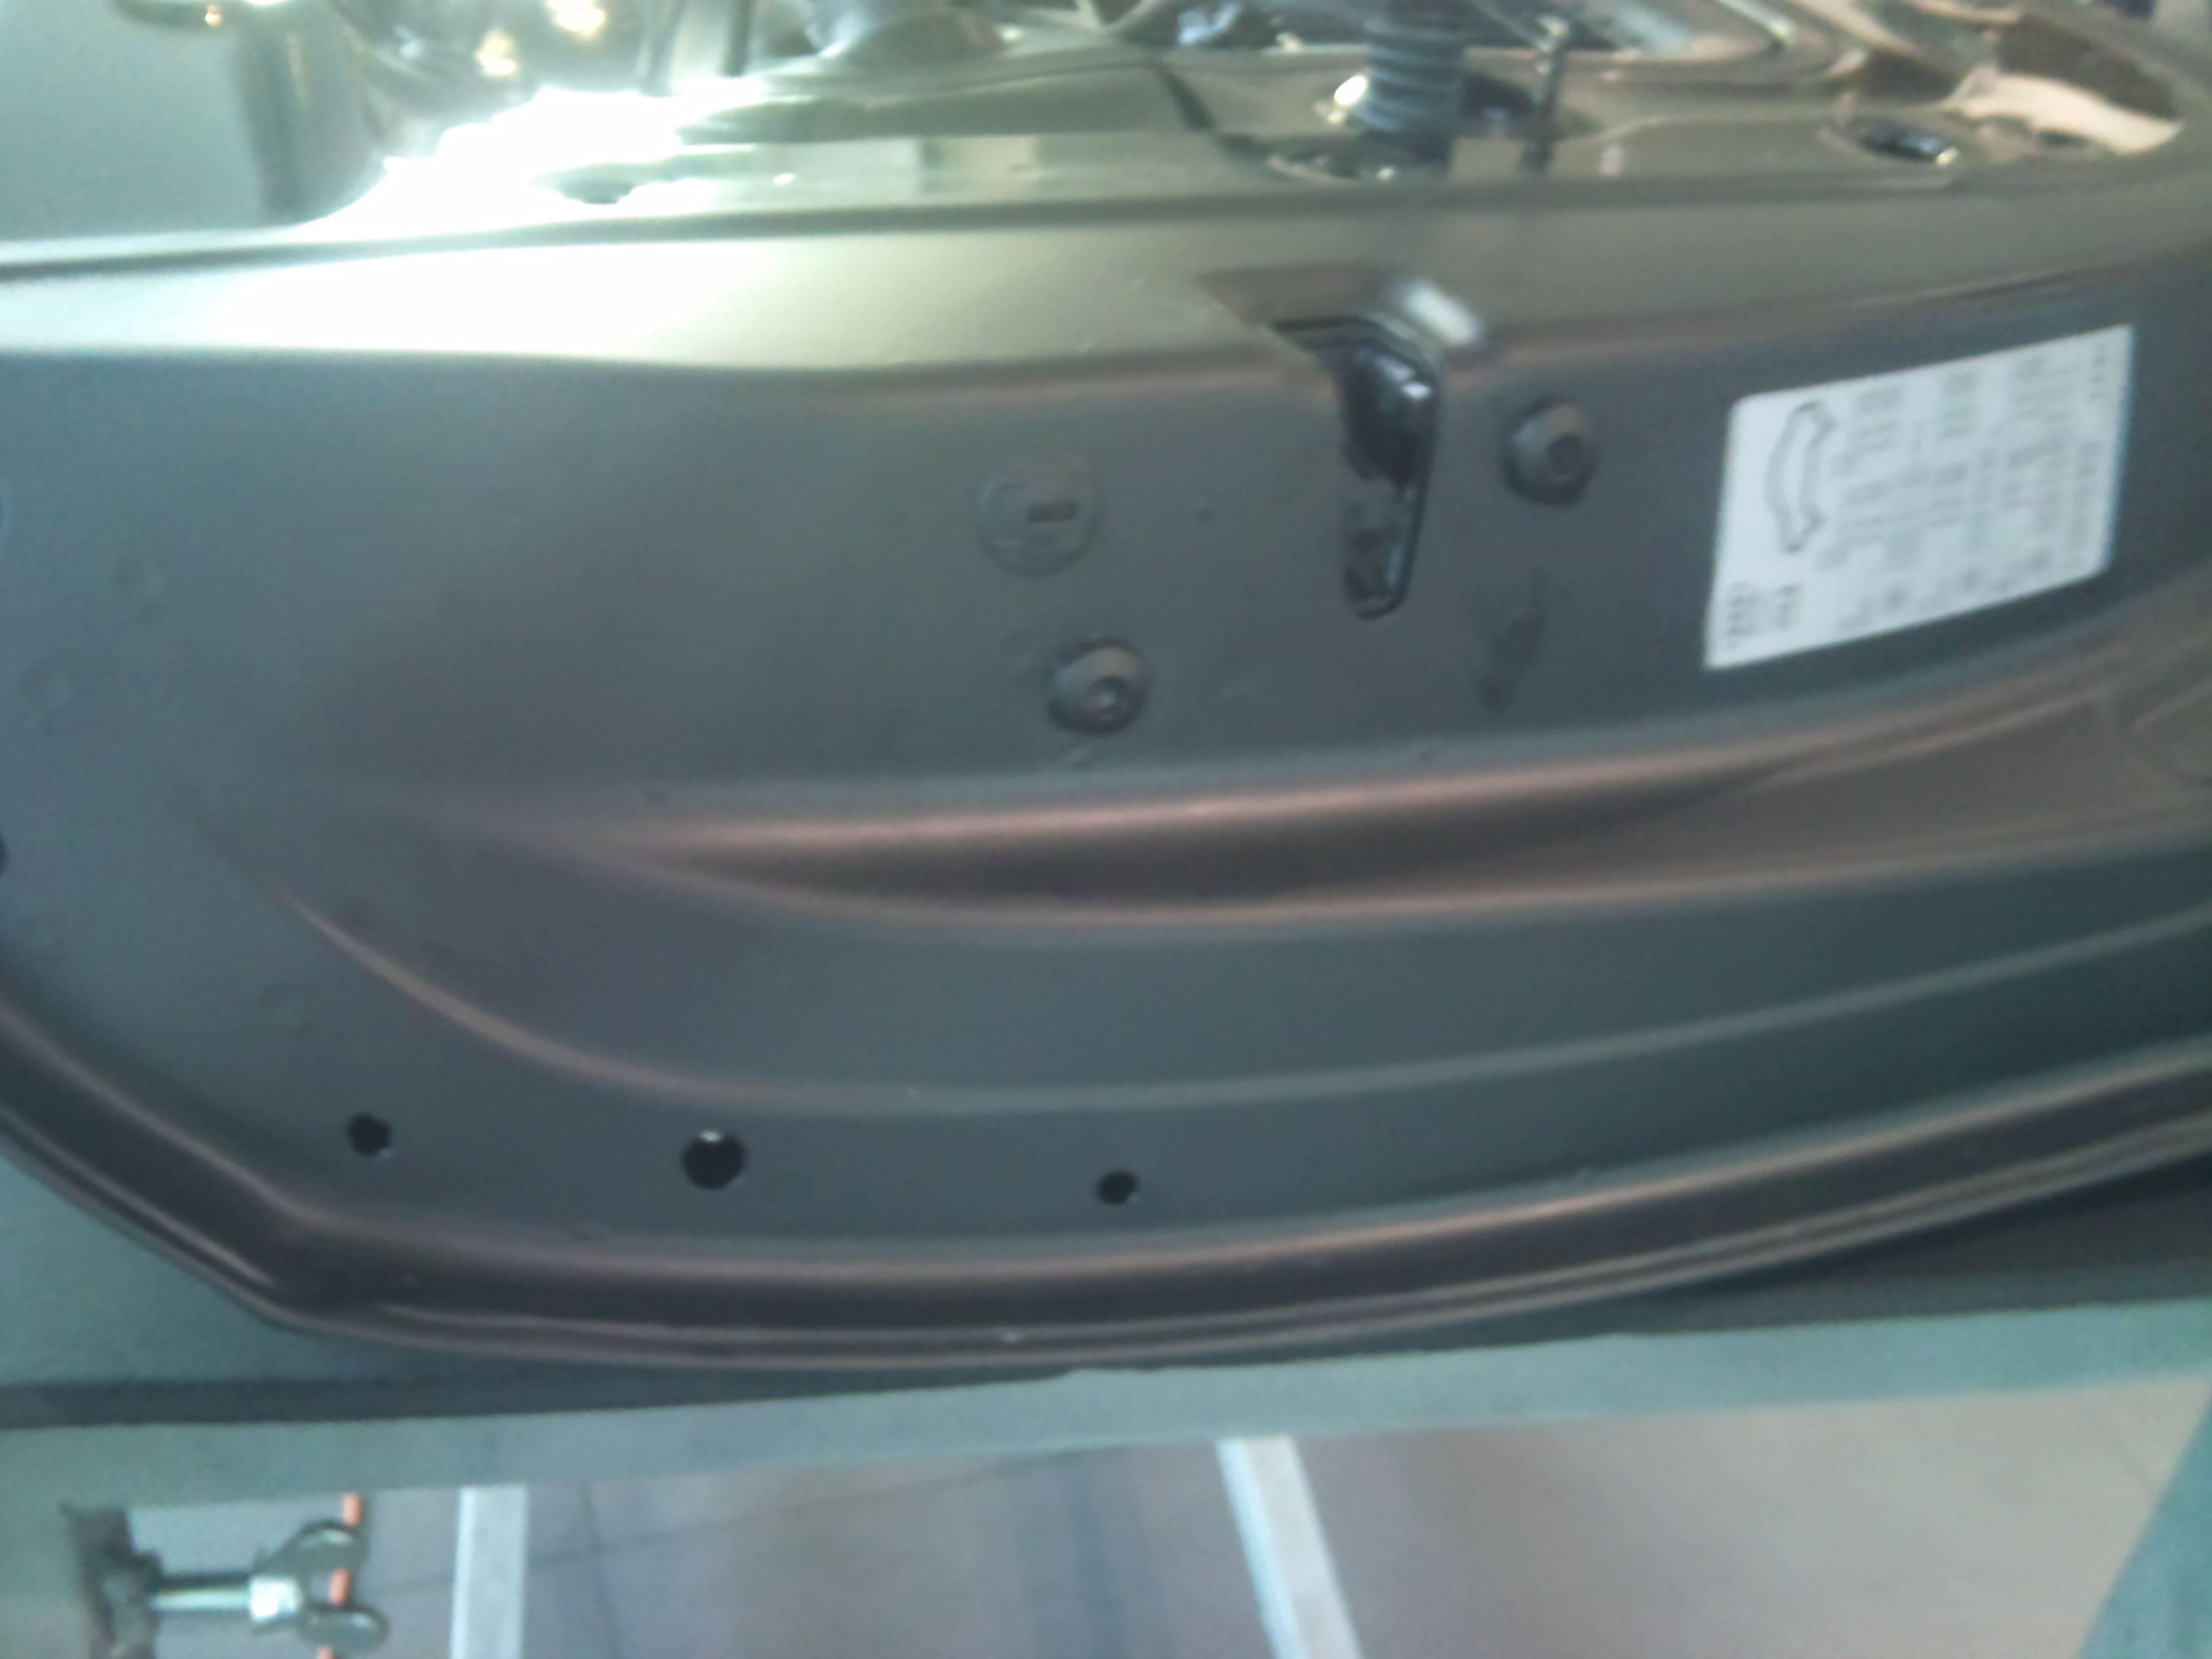 Audi A5 Coupe met Mat Zwarte Wrap, Carwrapping door Wrapmyride.nu Foto-nr:4560, ©2021